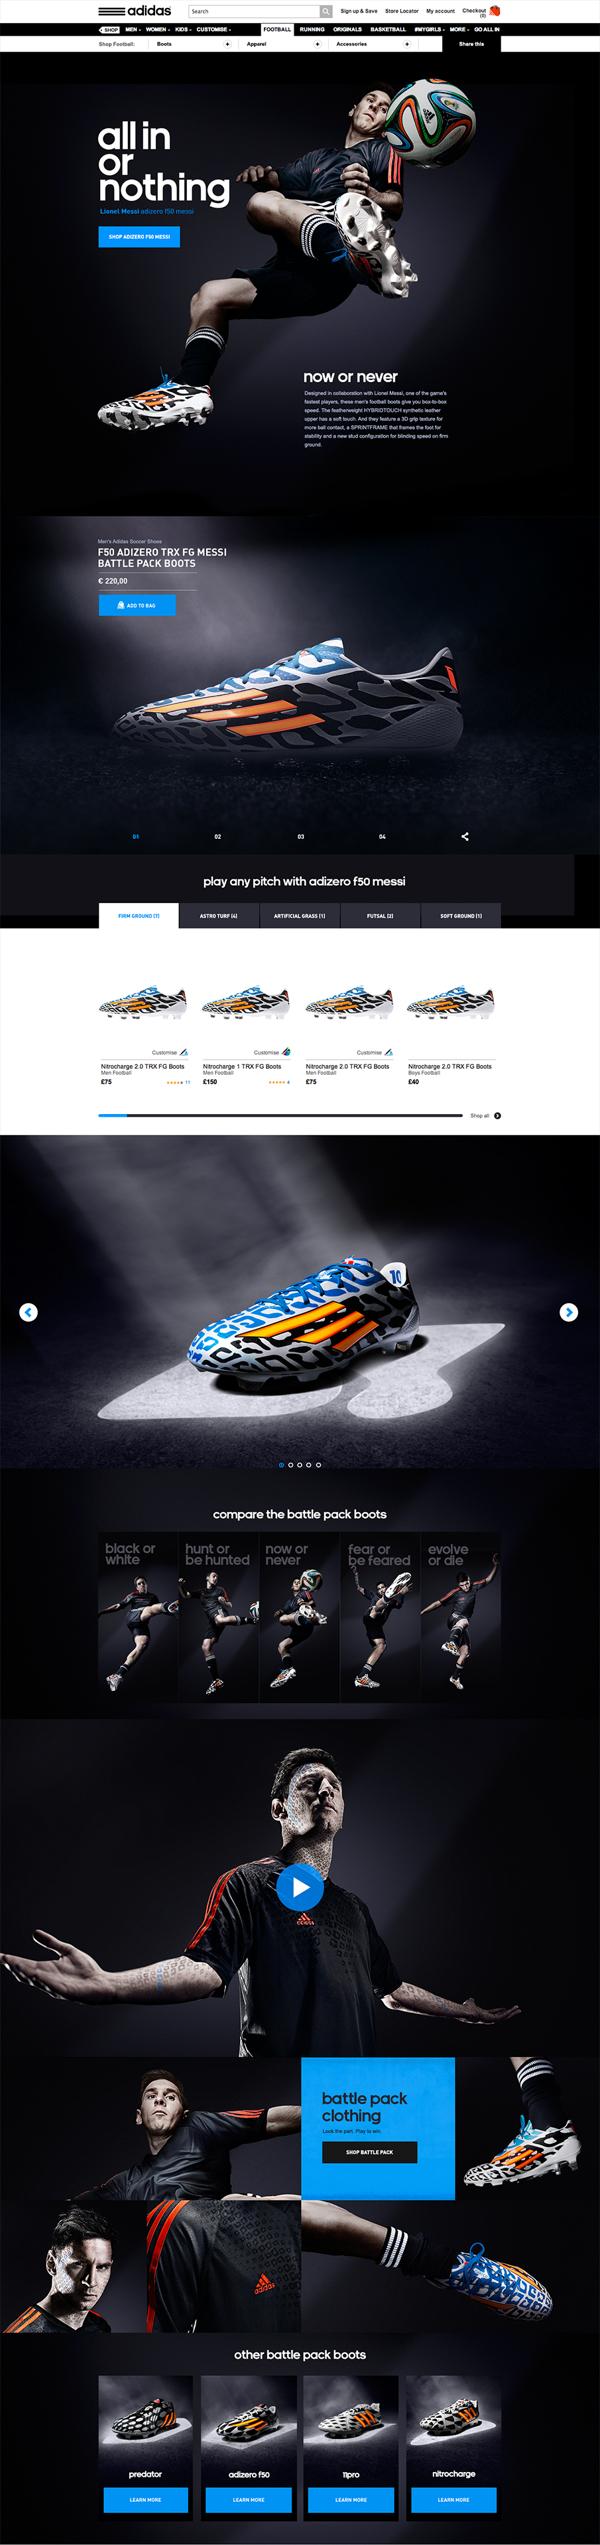 adidas - Battle Pack on